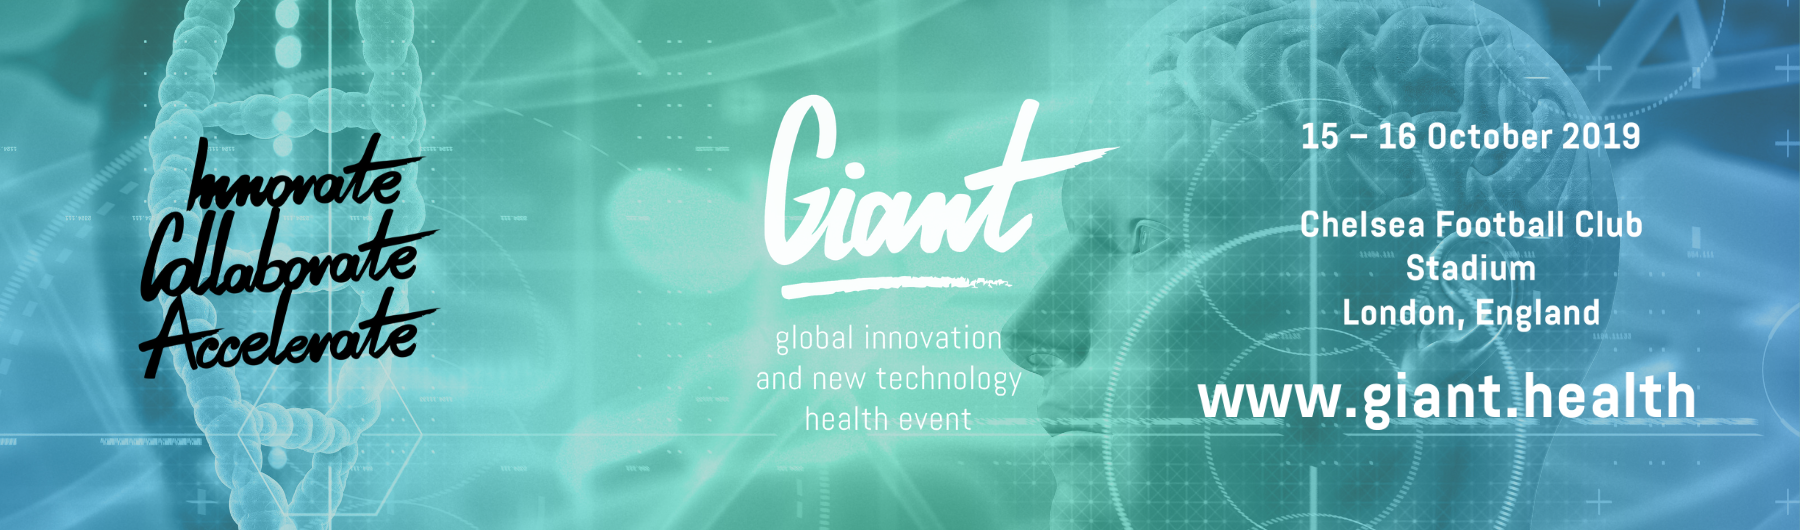 GIANT Health Event 2019